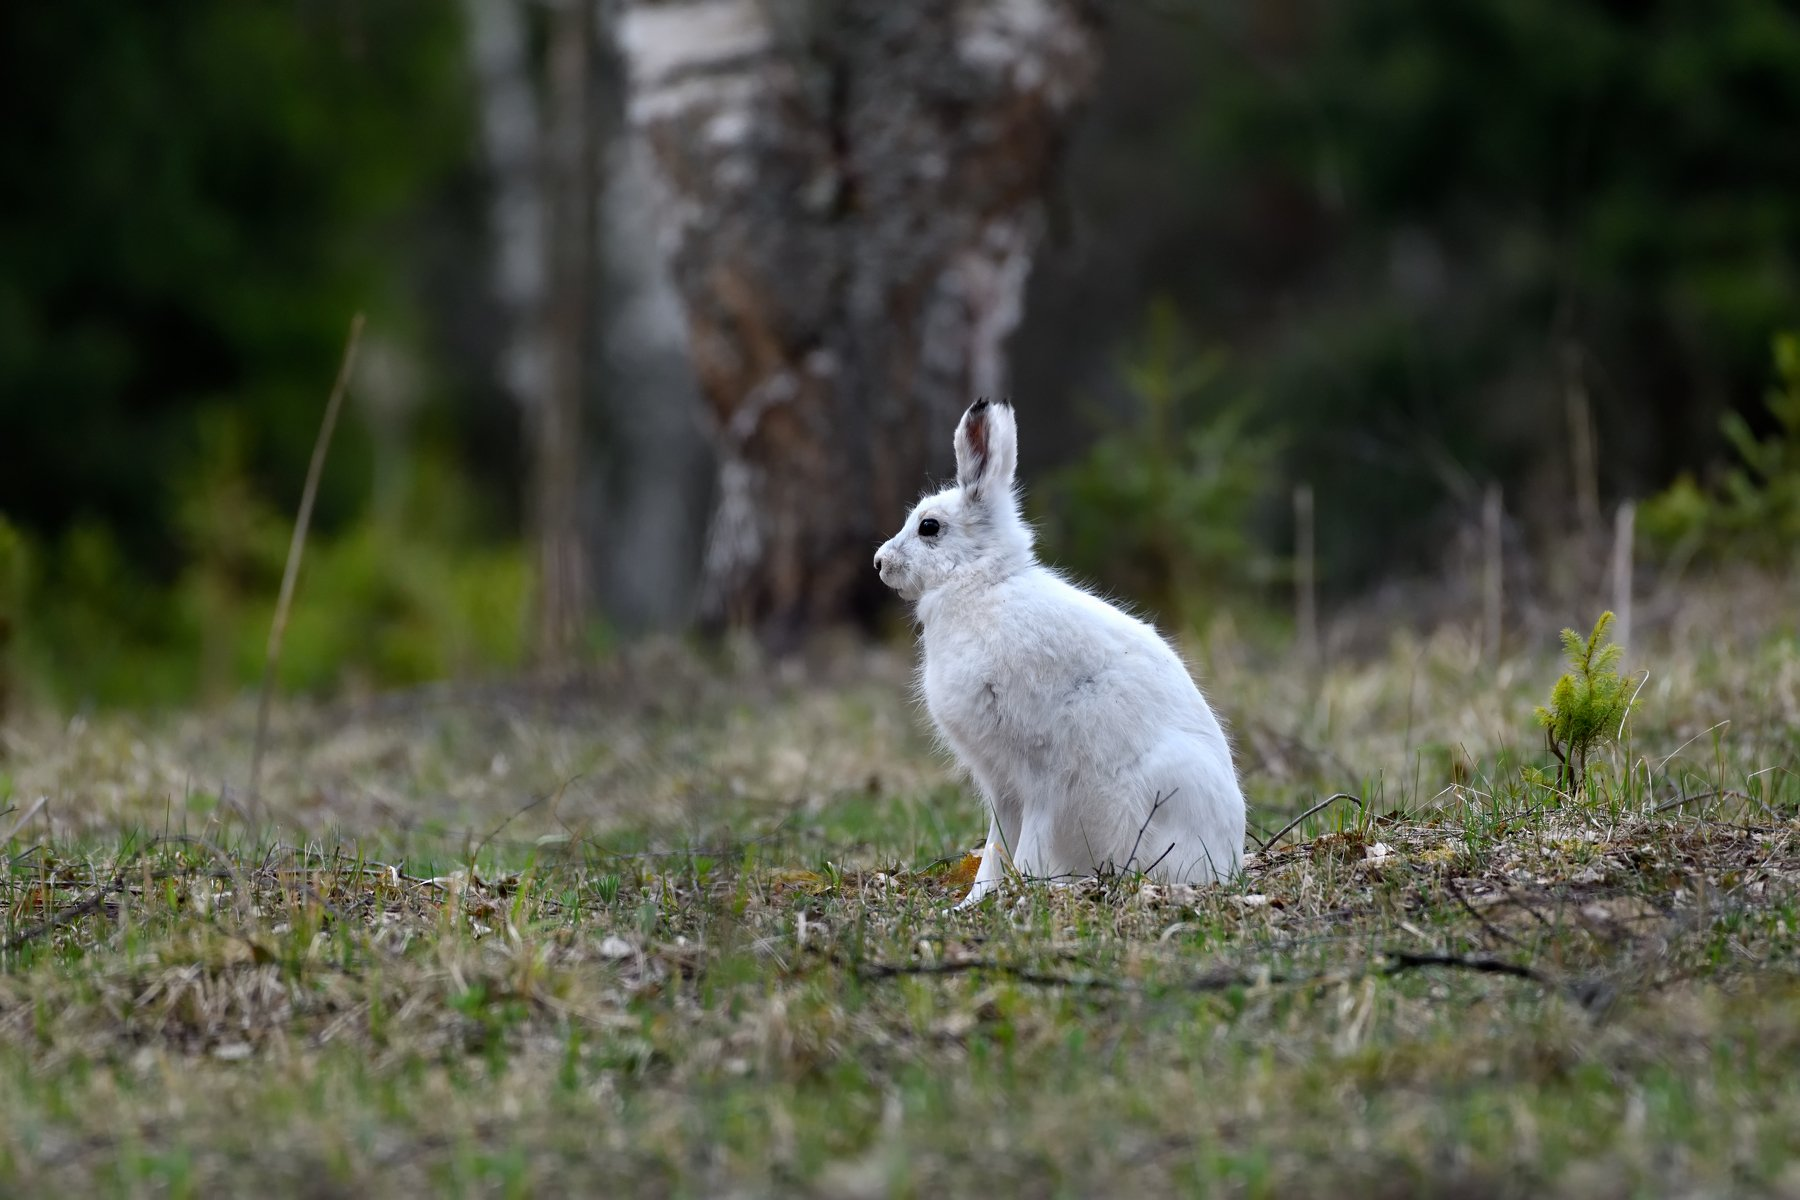 лес,весна,заяц,беляк, Полуэктов Виталий